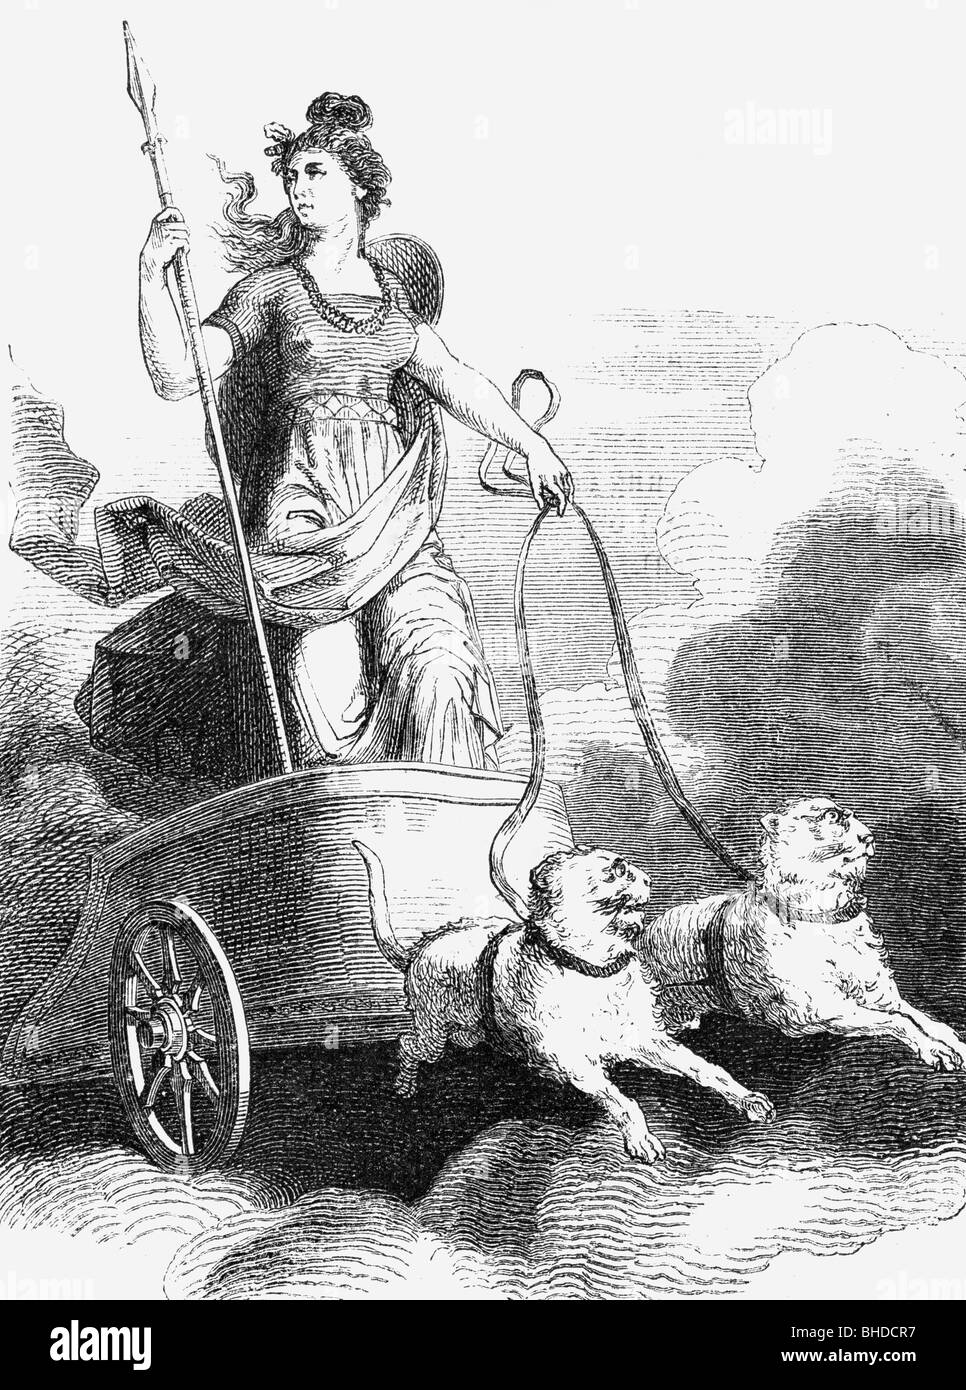 Freyja Germanic Goddess Of Love And Fertility On A Chariot